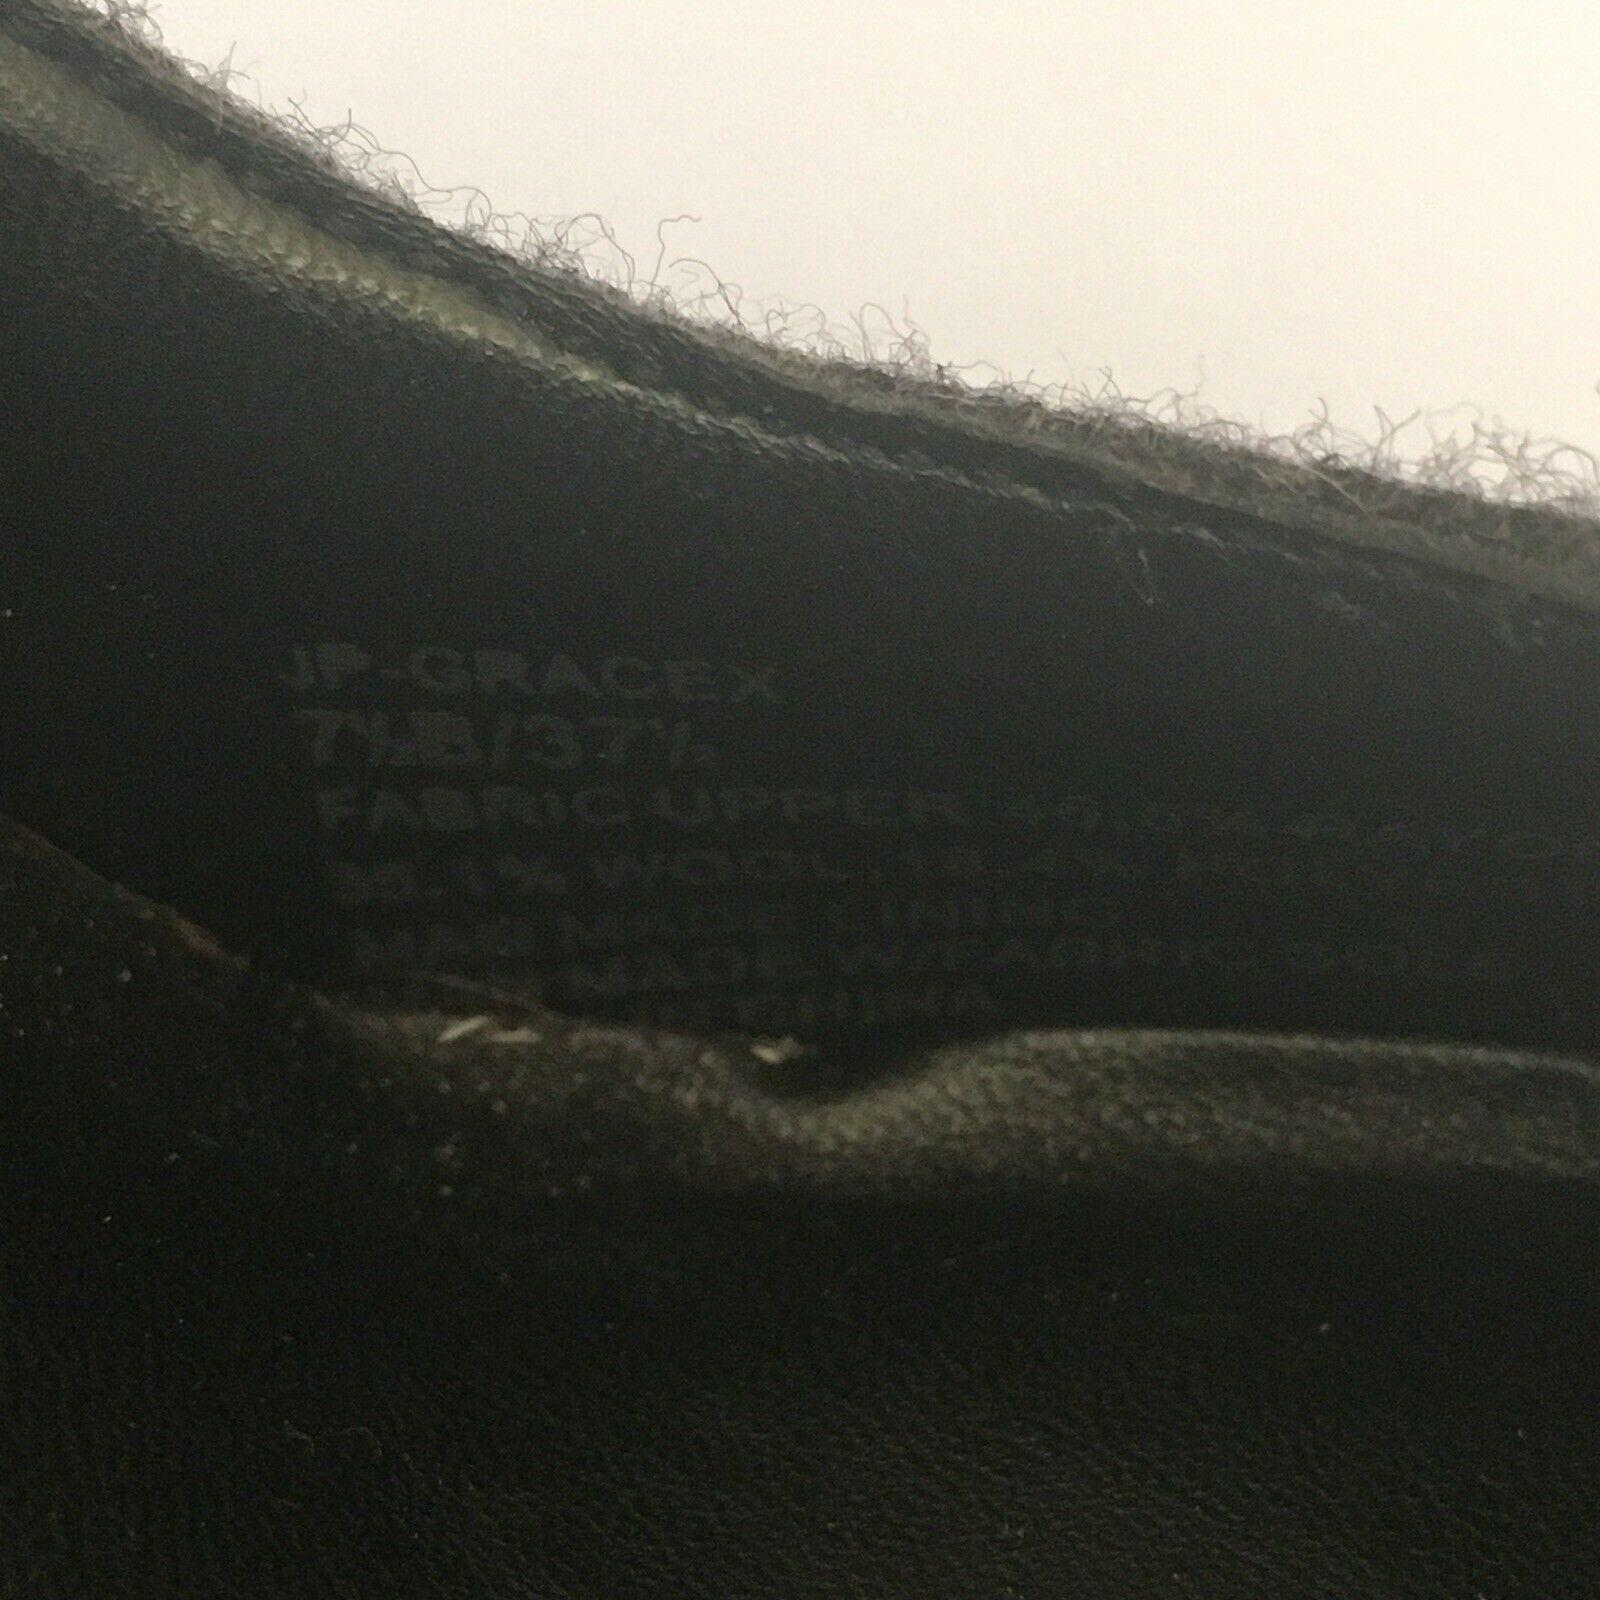 Jessica Simpson Gracex Gray Wool Round Toe Platform Pumps Heels Size 7.5 M  image 9